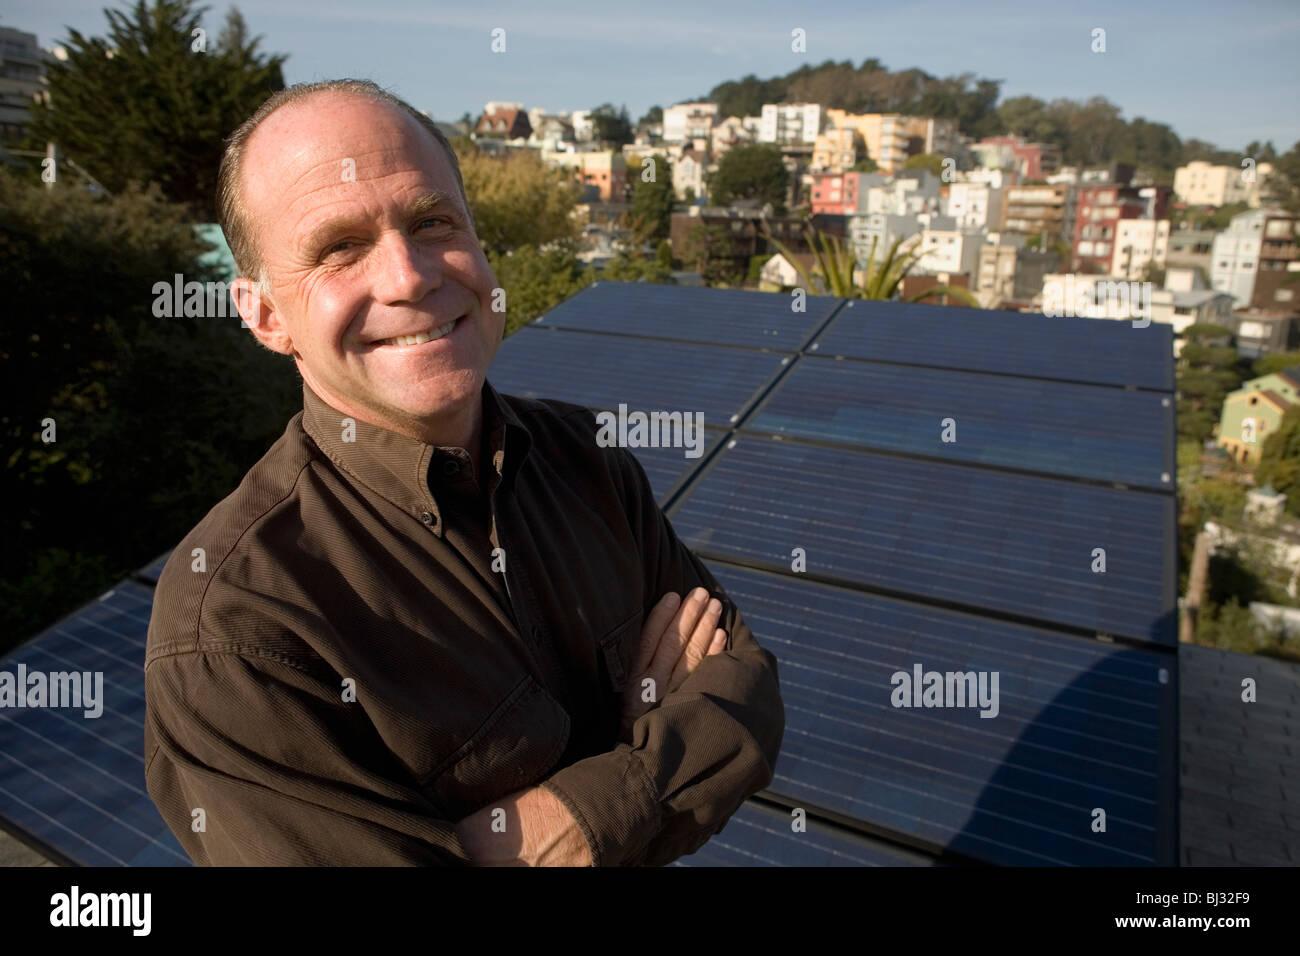 Residential installation of solar panels - Stock Image